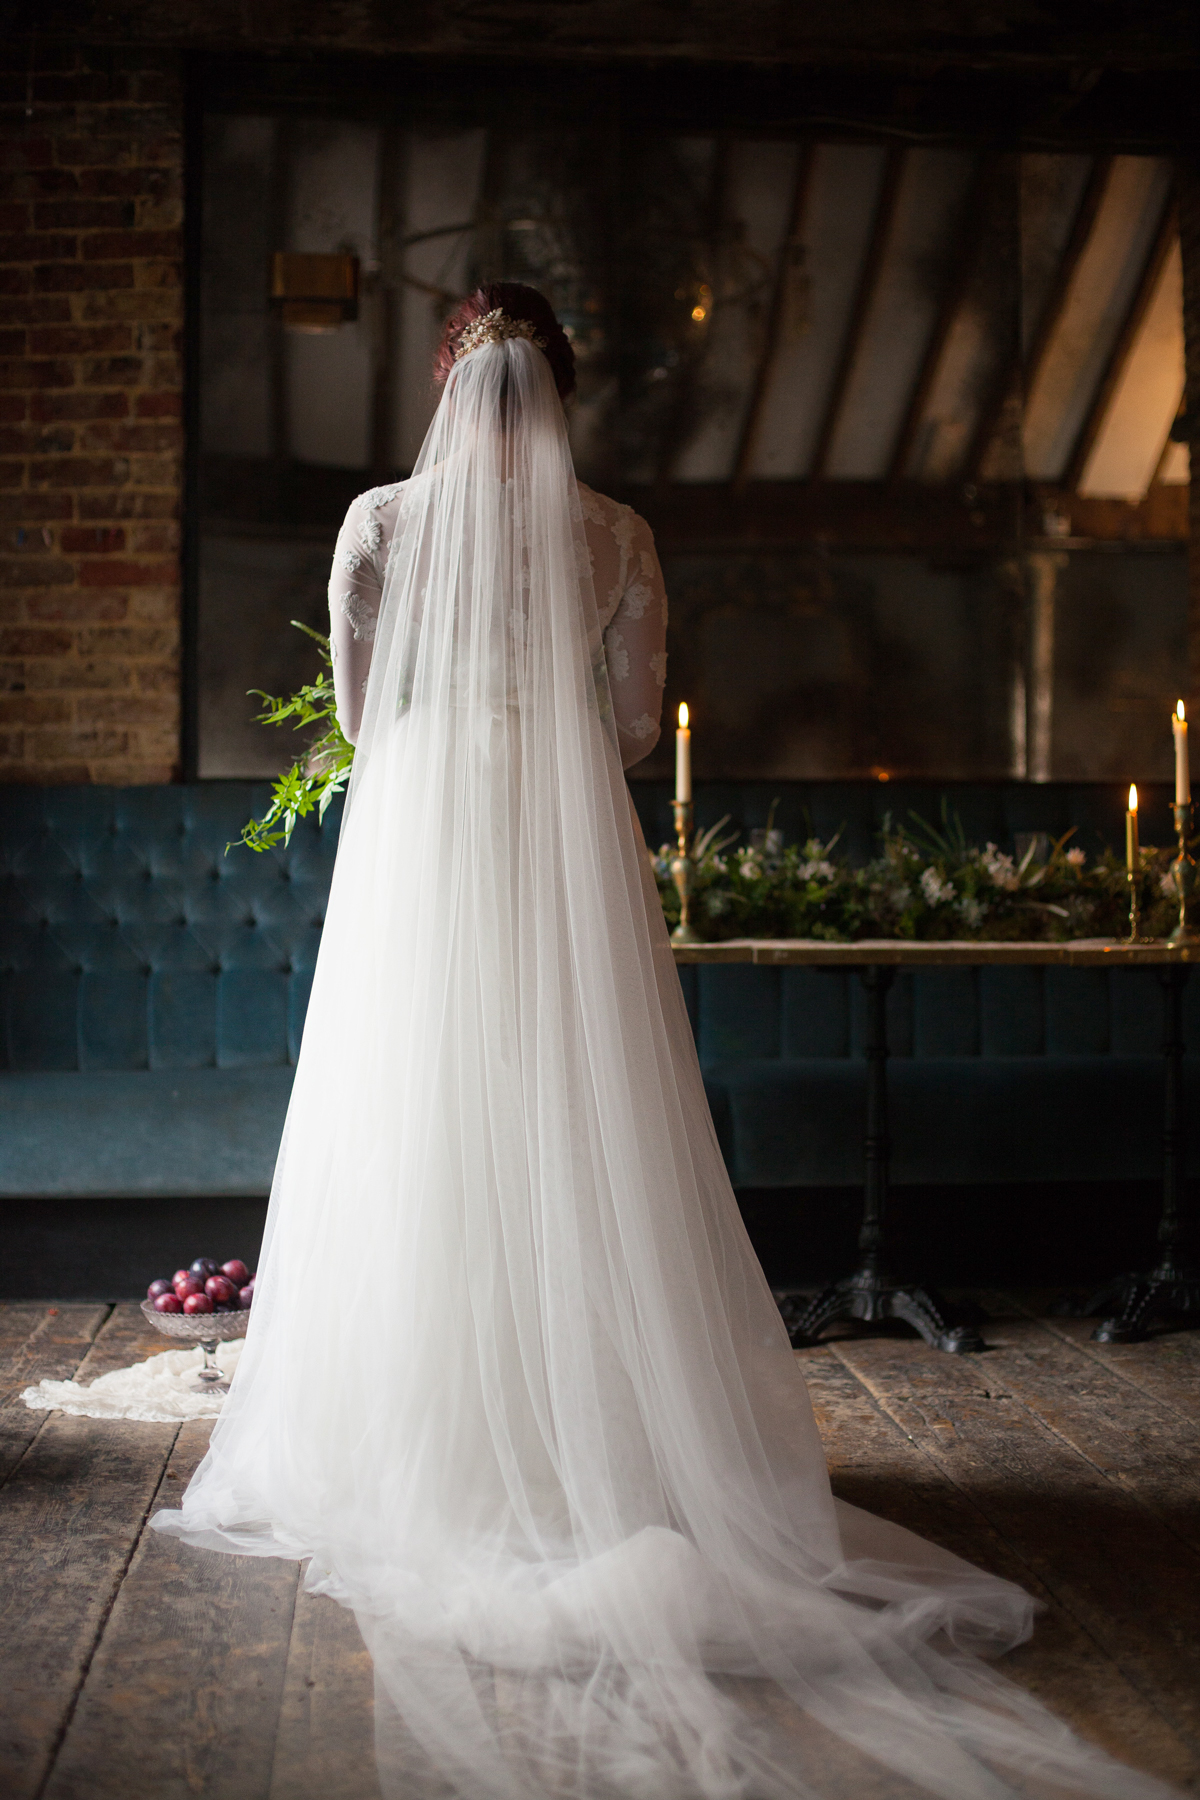 back of bride wearing long veil